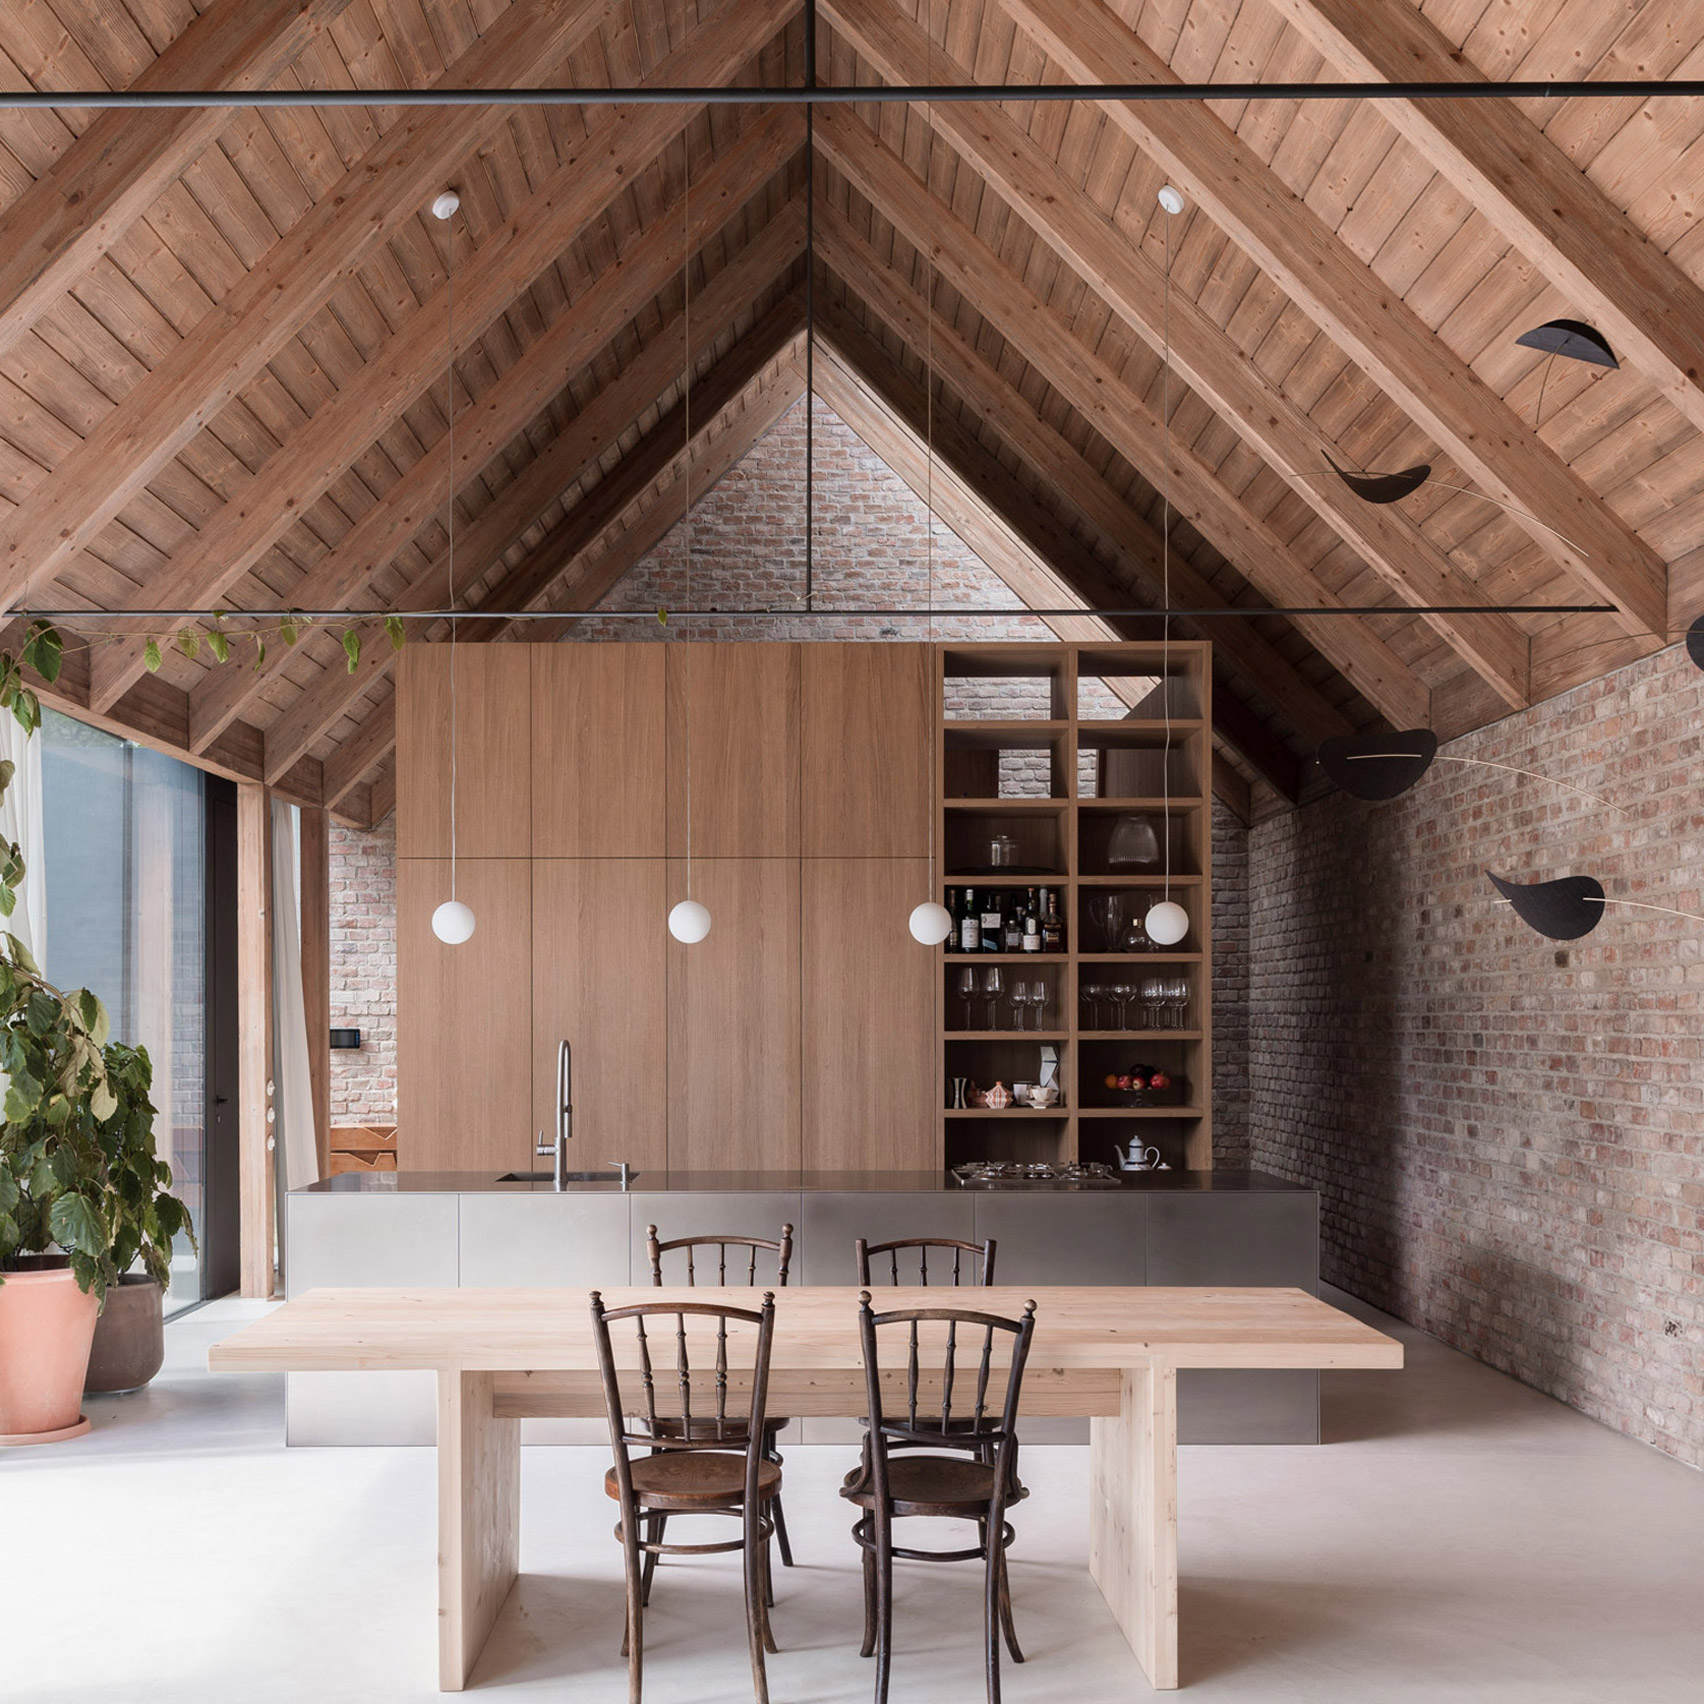 Dezeen's top home interiors of 2020: House V by Martin Skocek